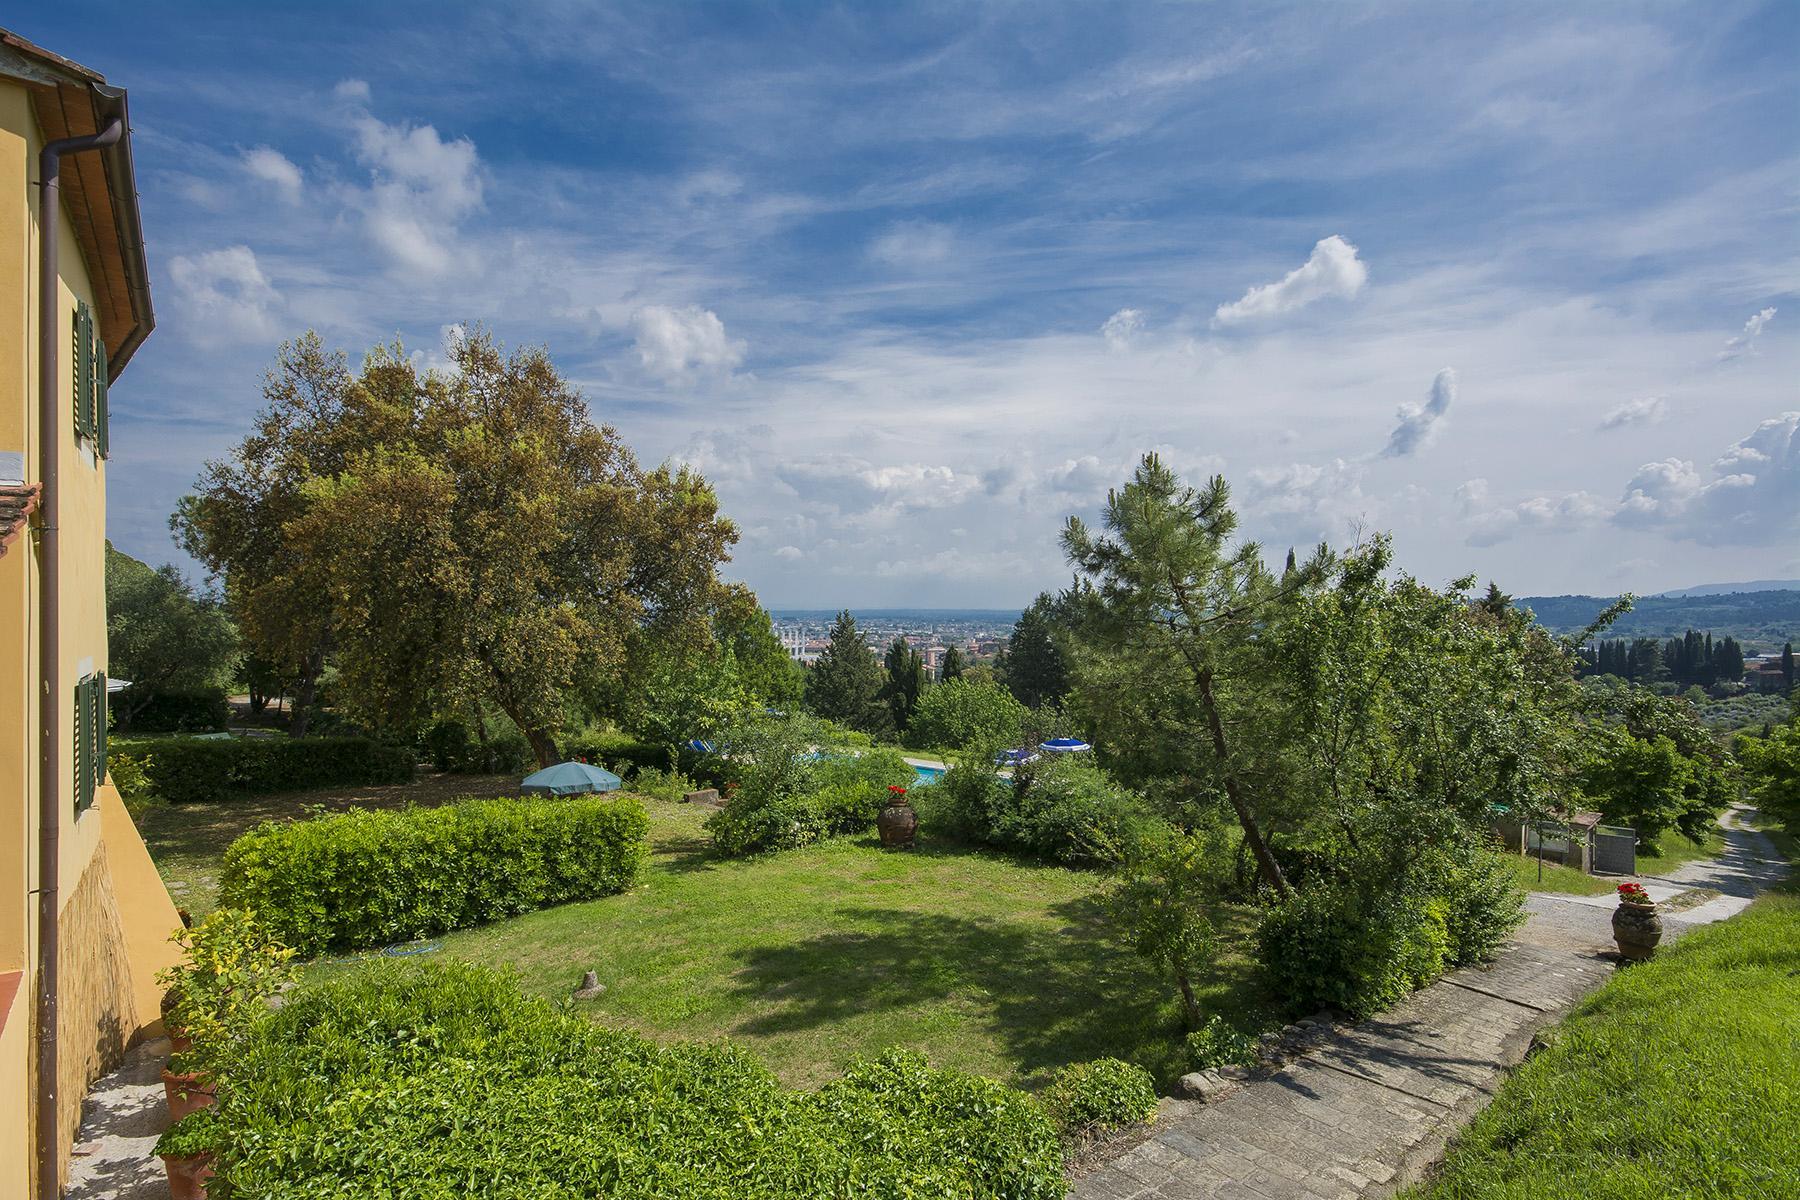 Pescia小山丘上美丽的乡间农舍 - 36